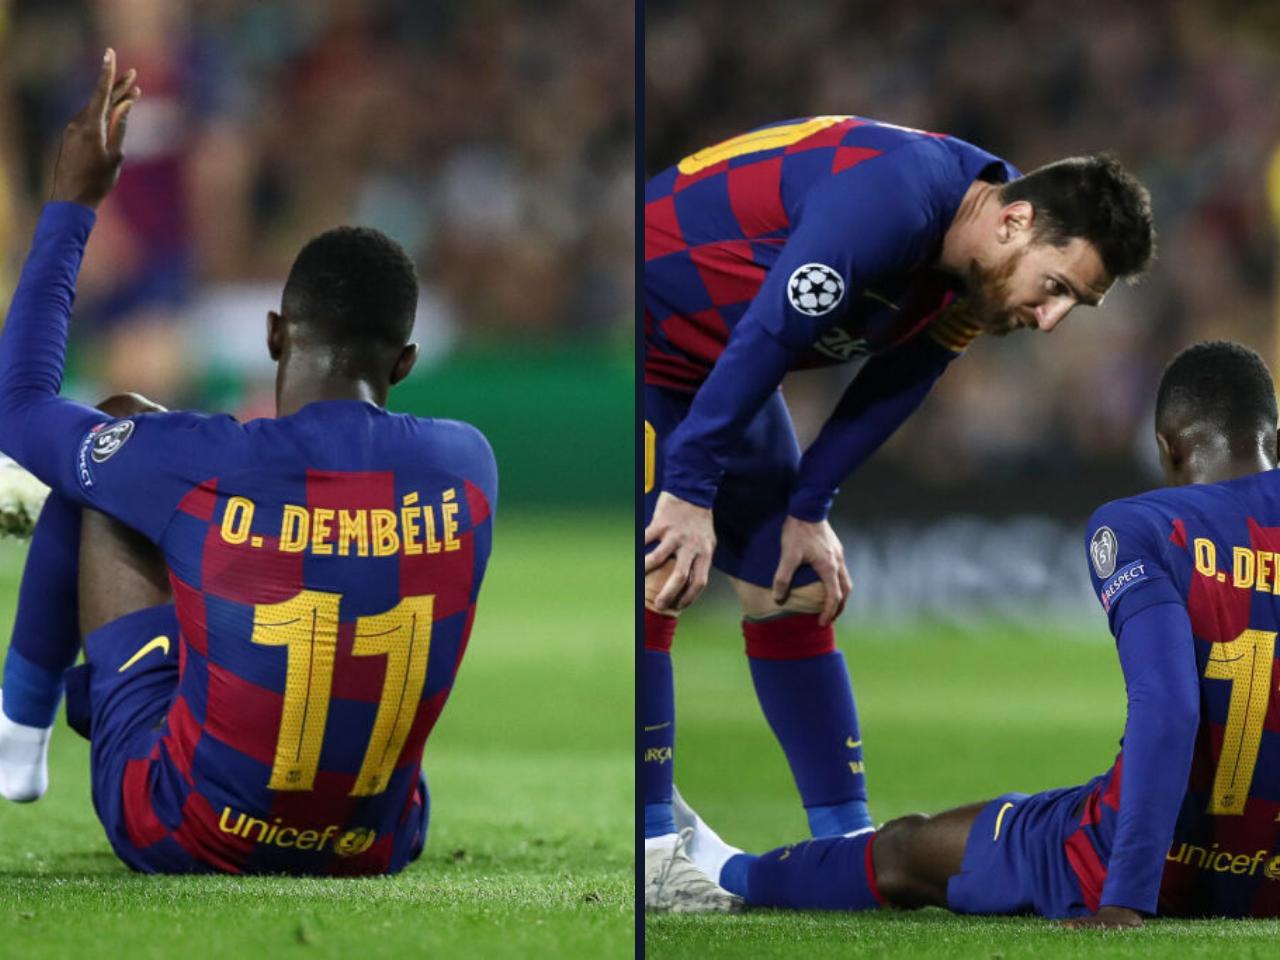 dembele injured again